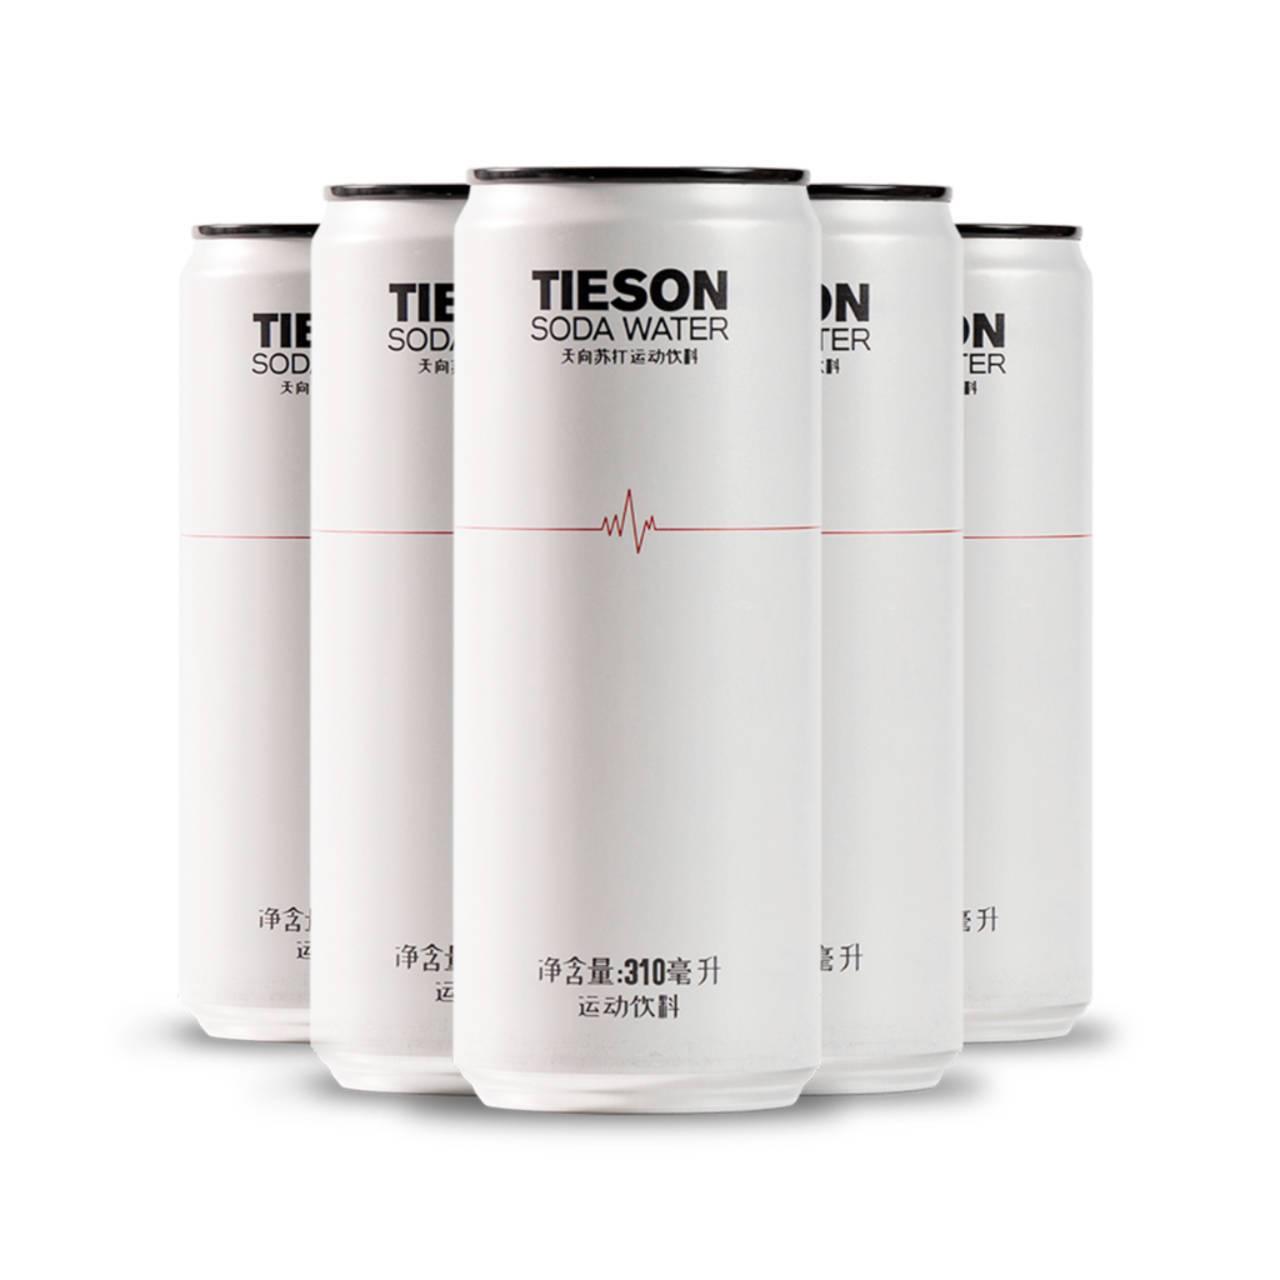 Tieson天向白罐西柚味功能运动饮料补充弱碱电解质水310ml*6罐箱优惠券